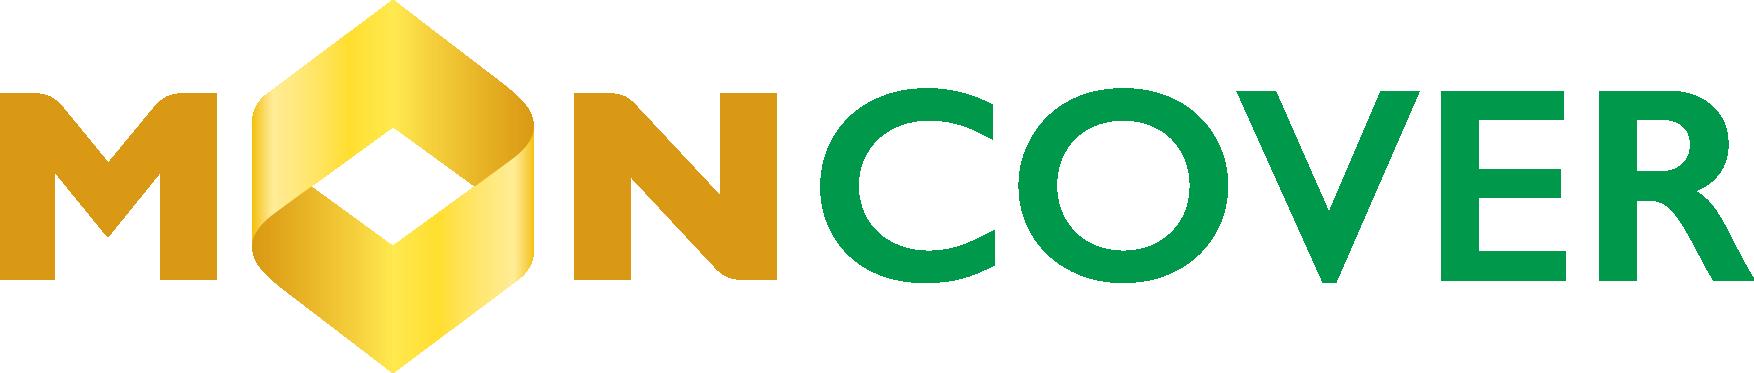 logo moncover